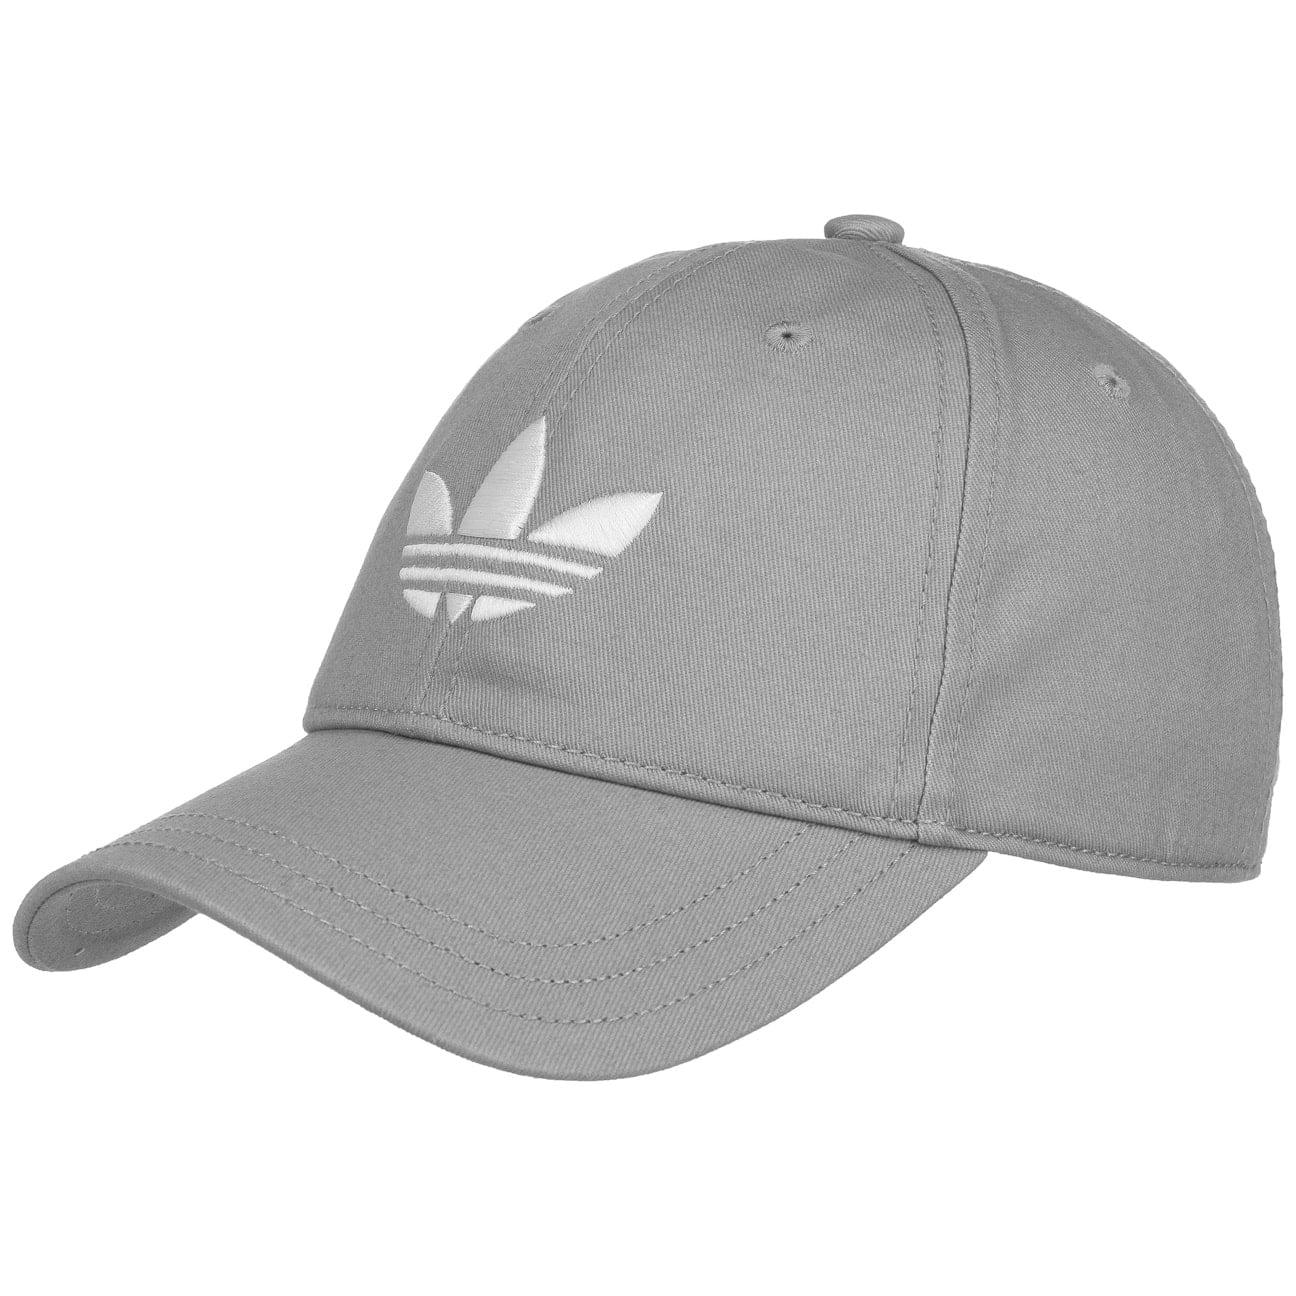 Casquette Trefoil Baseball Cap by adidas